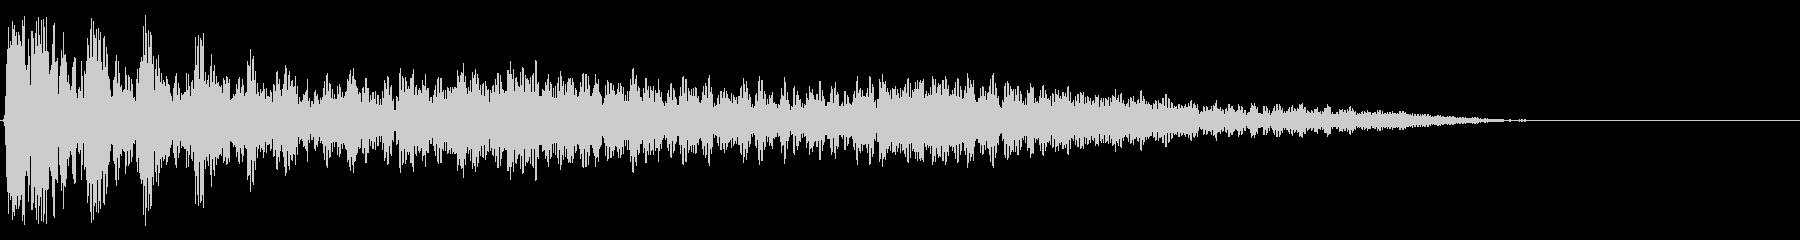 SynthHit EC03_15_2の未再生の波形